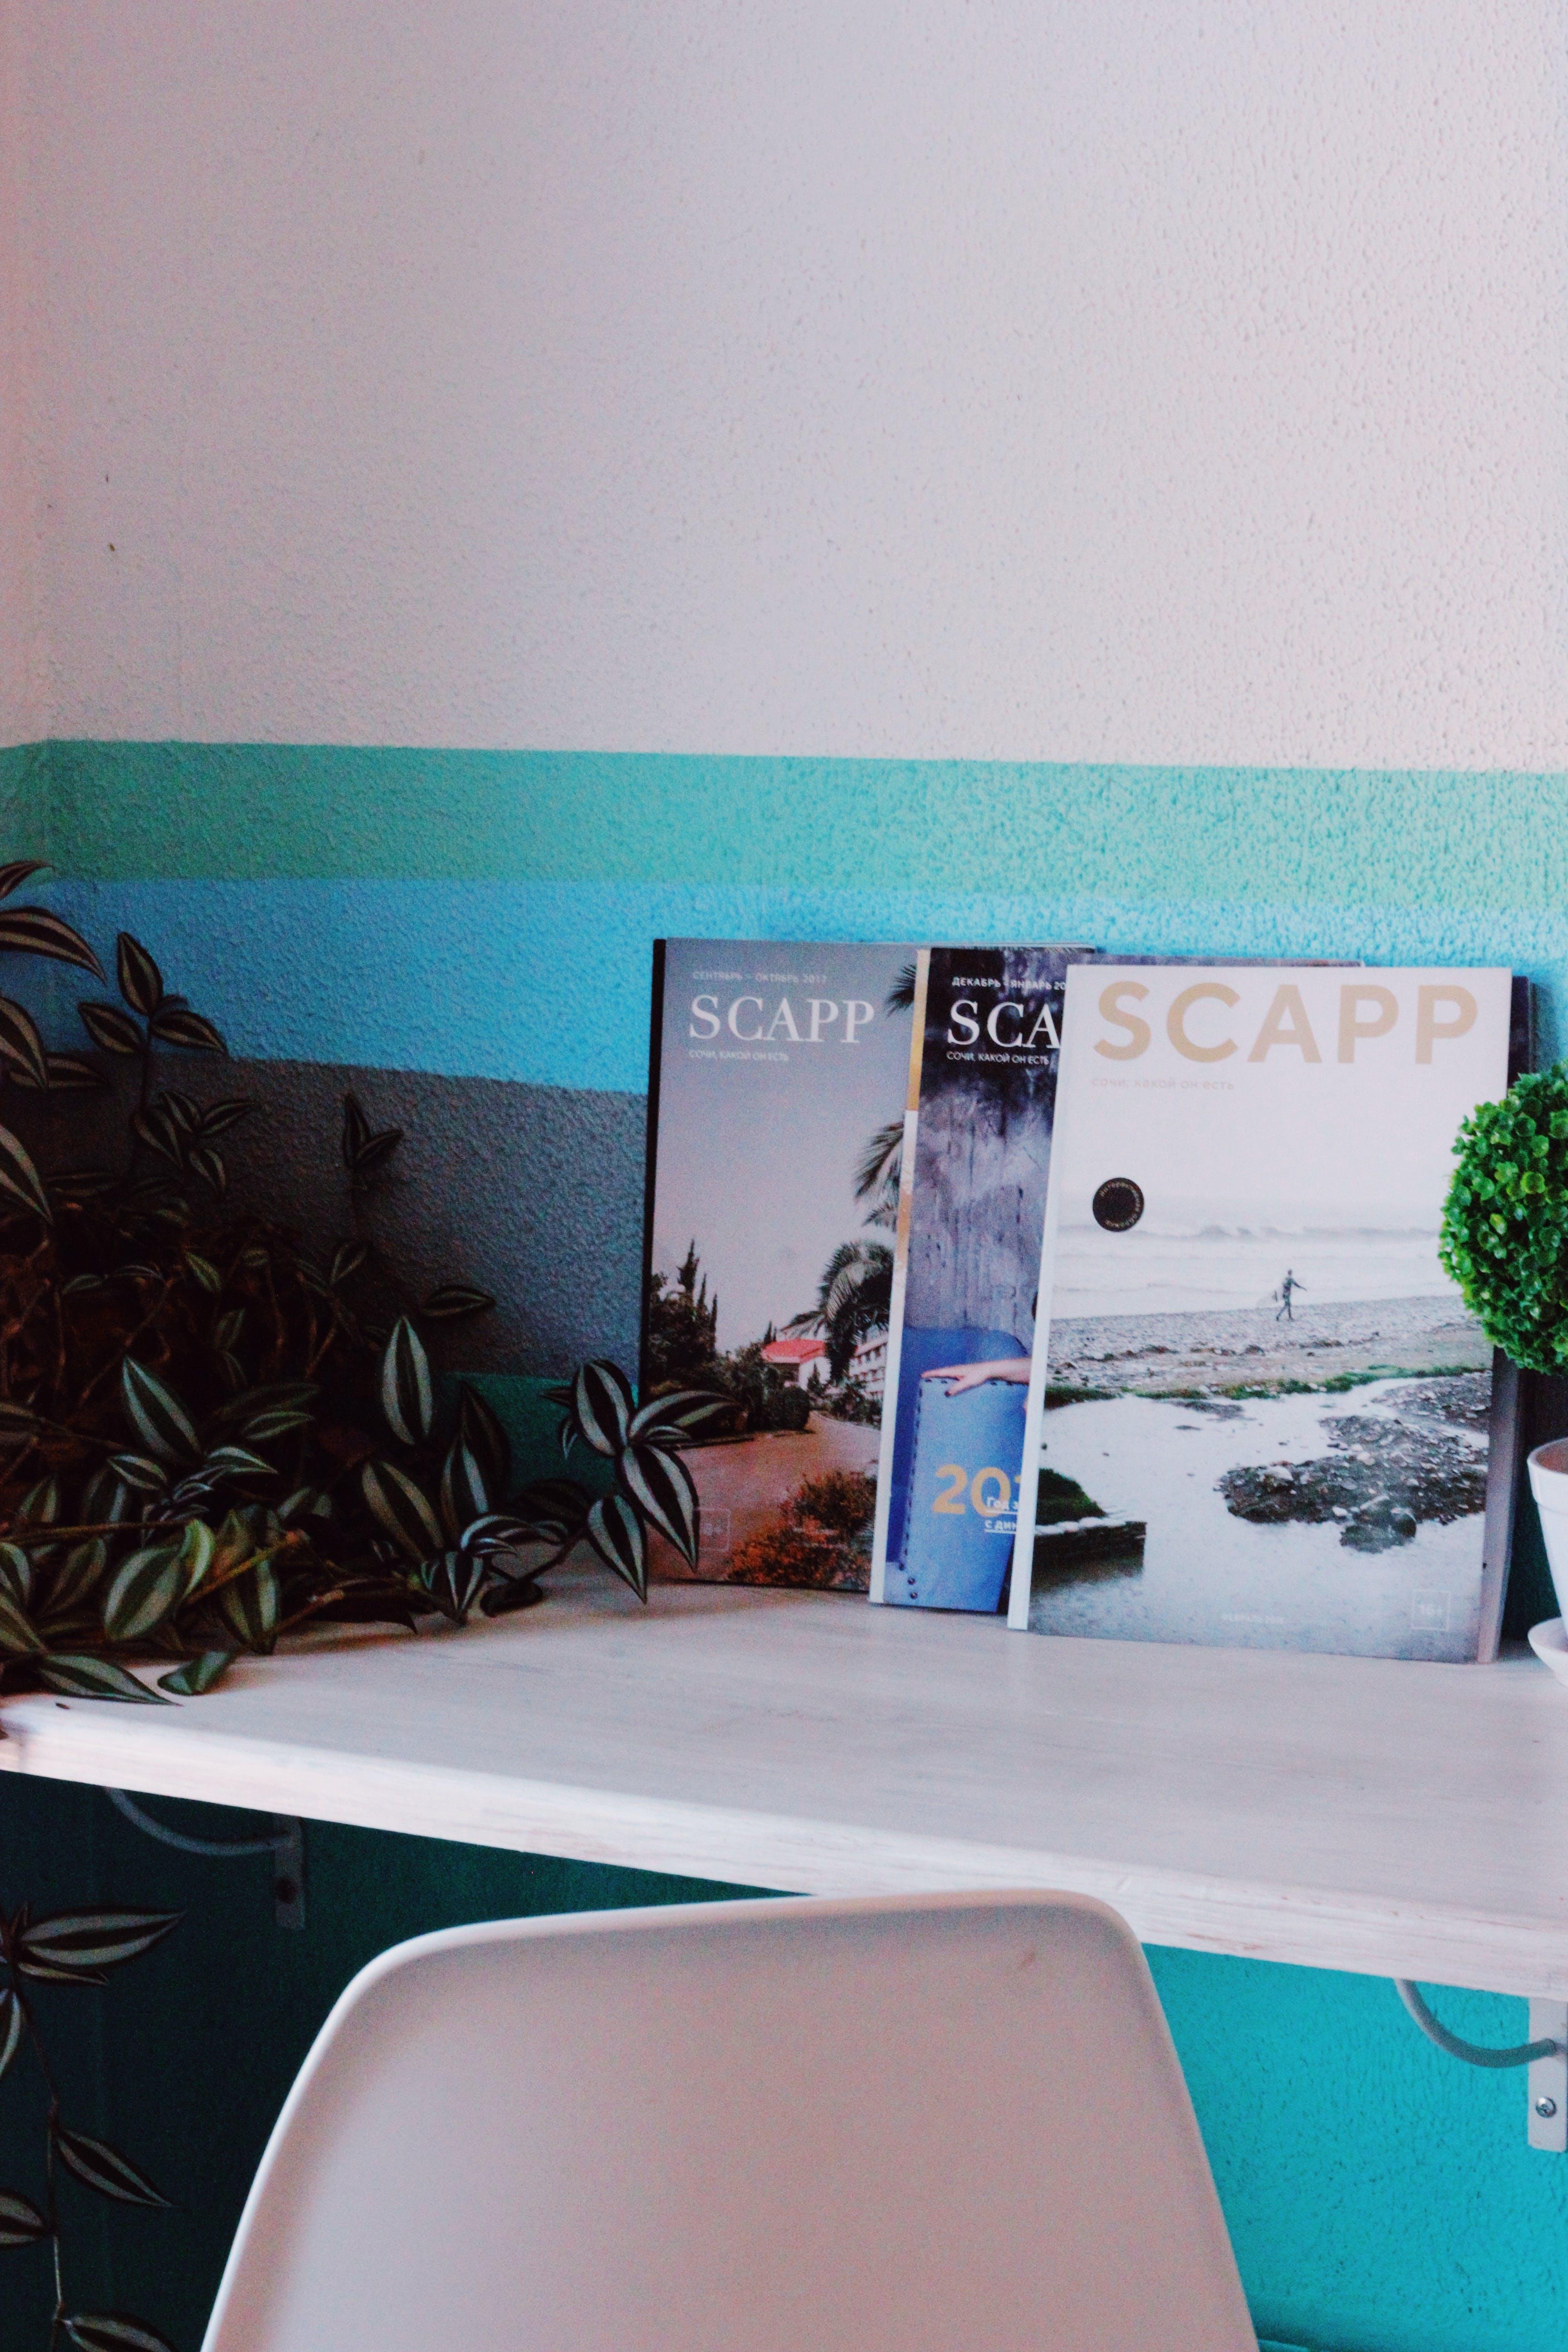 Scapp Magazine on Table